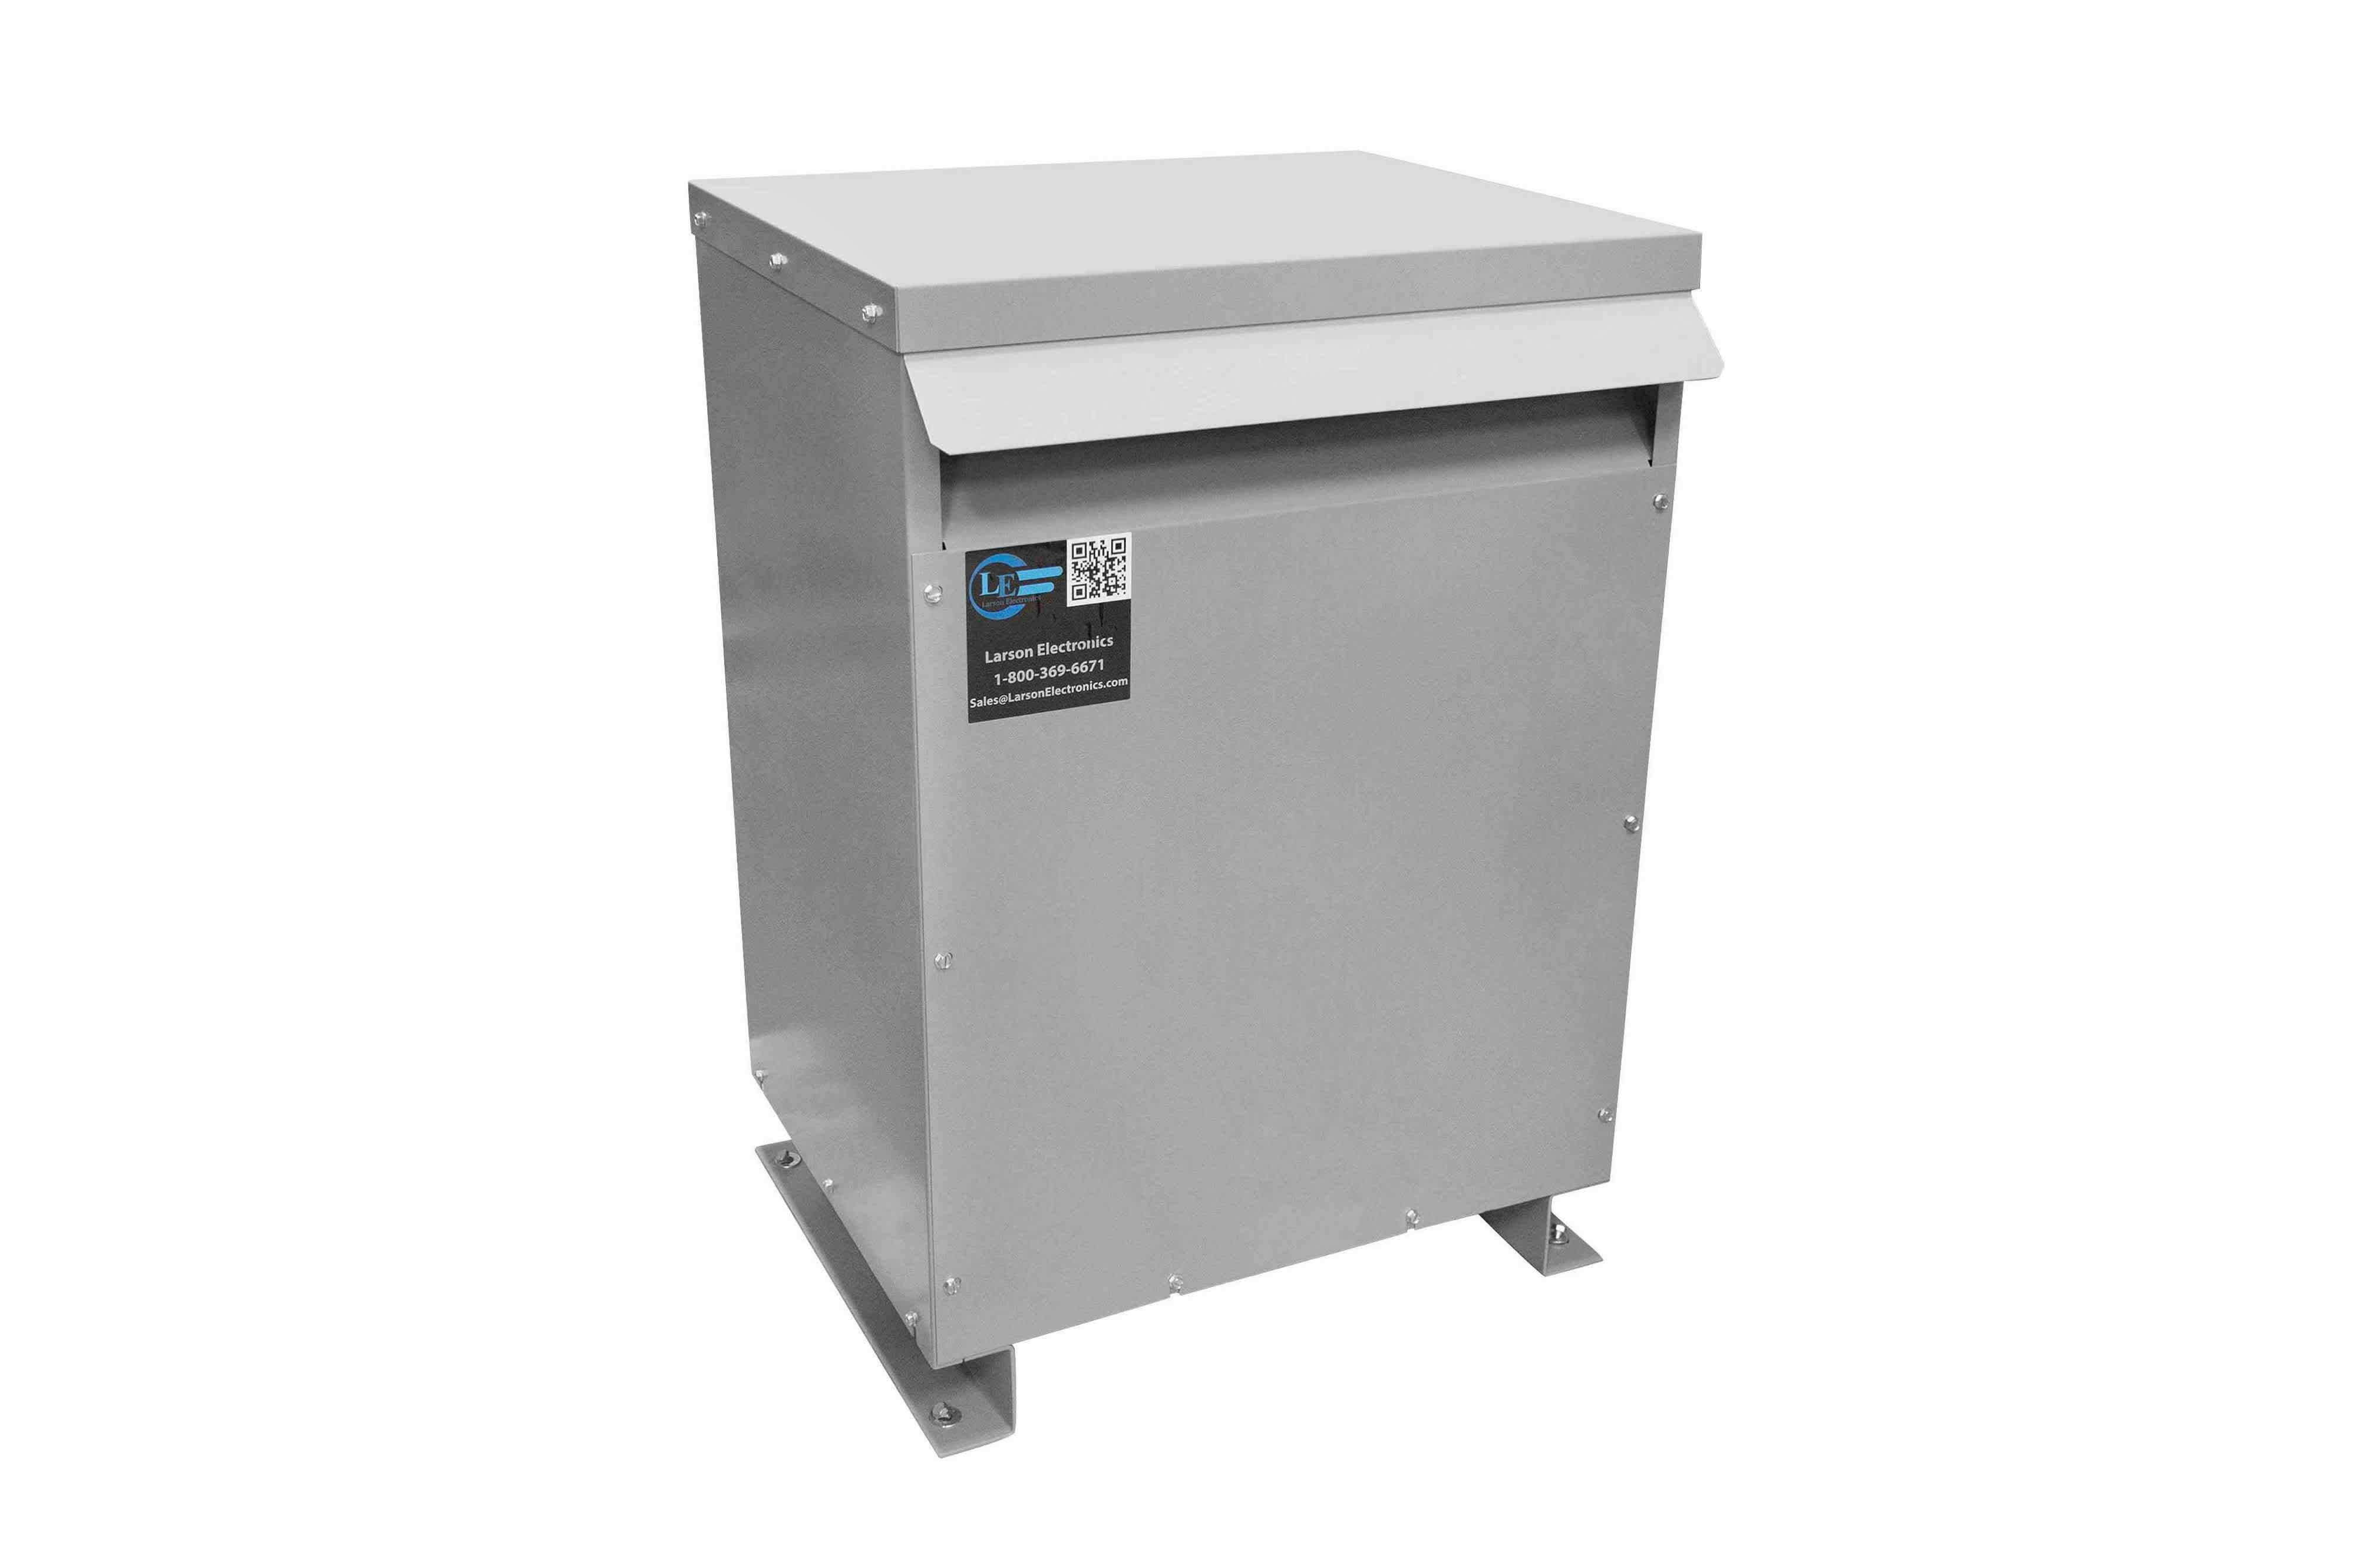 10 kVA 3PH Isolation Transformer, 480V Wye Primary, 380Y/220 Wye-N Secondary, N3R, Ventilated, 60 Hz